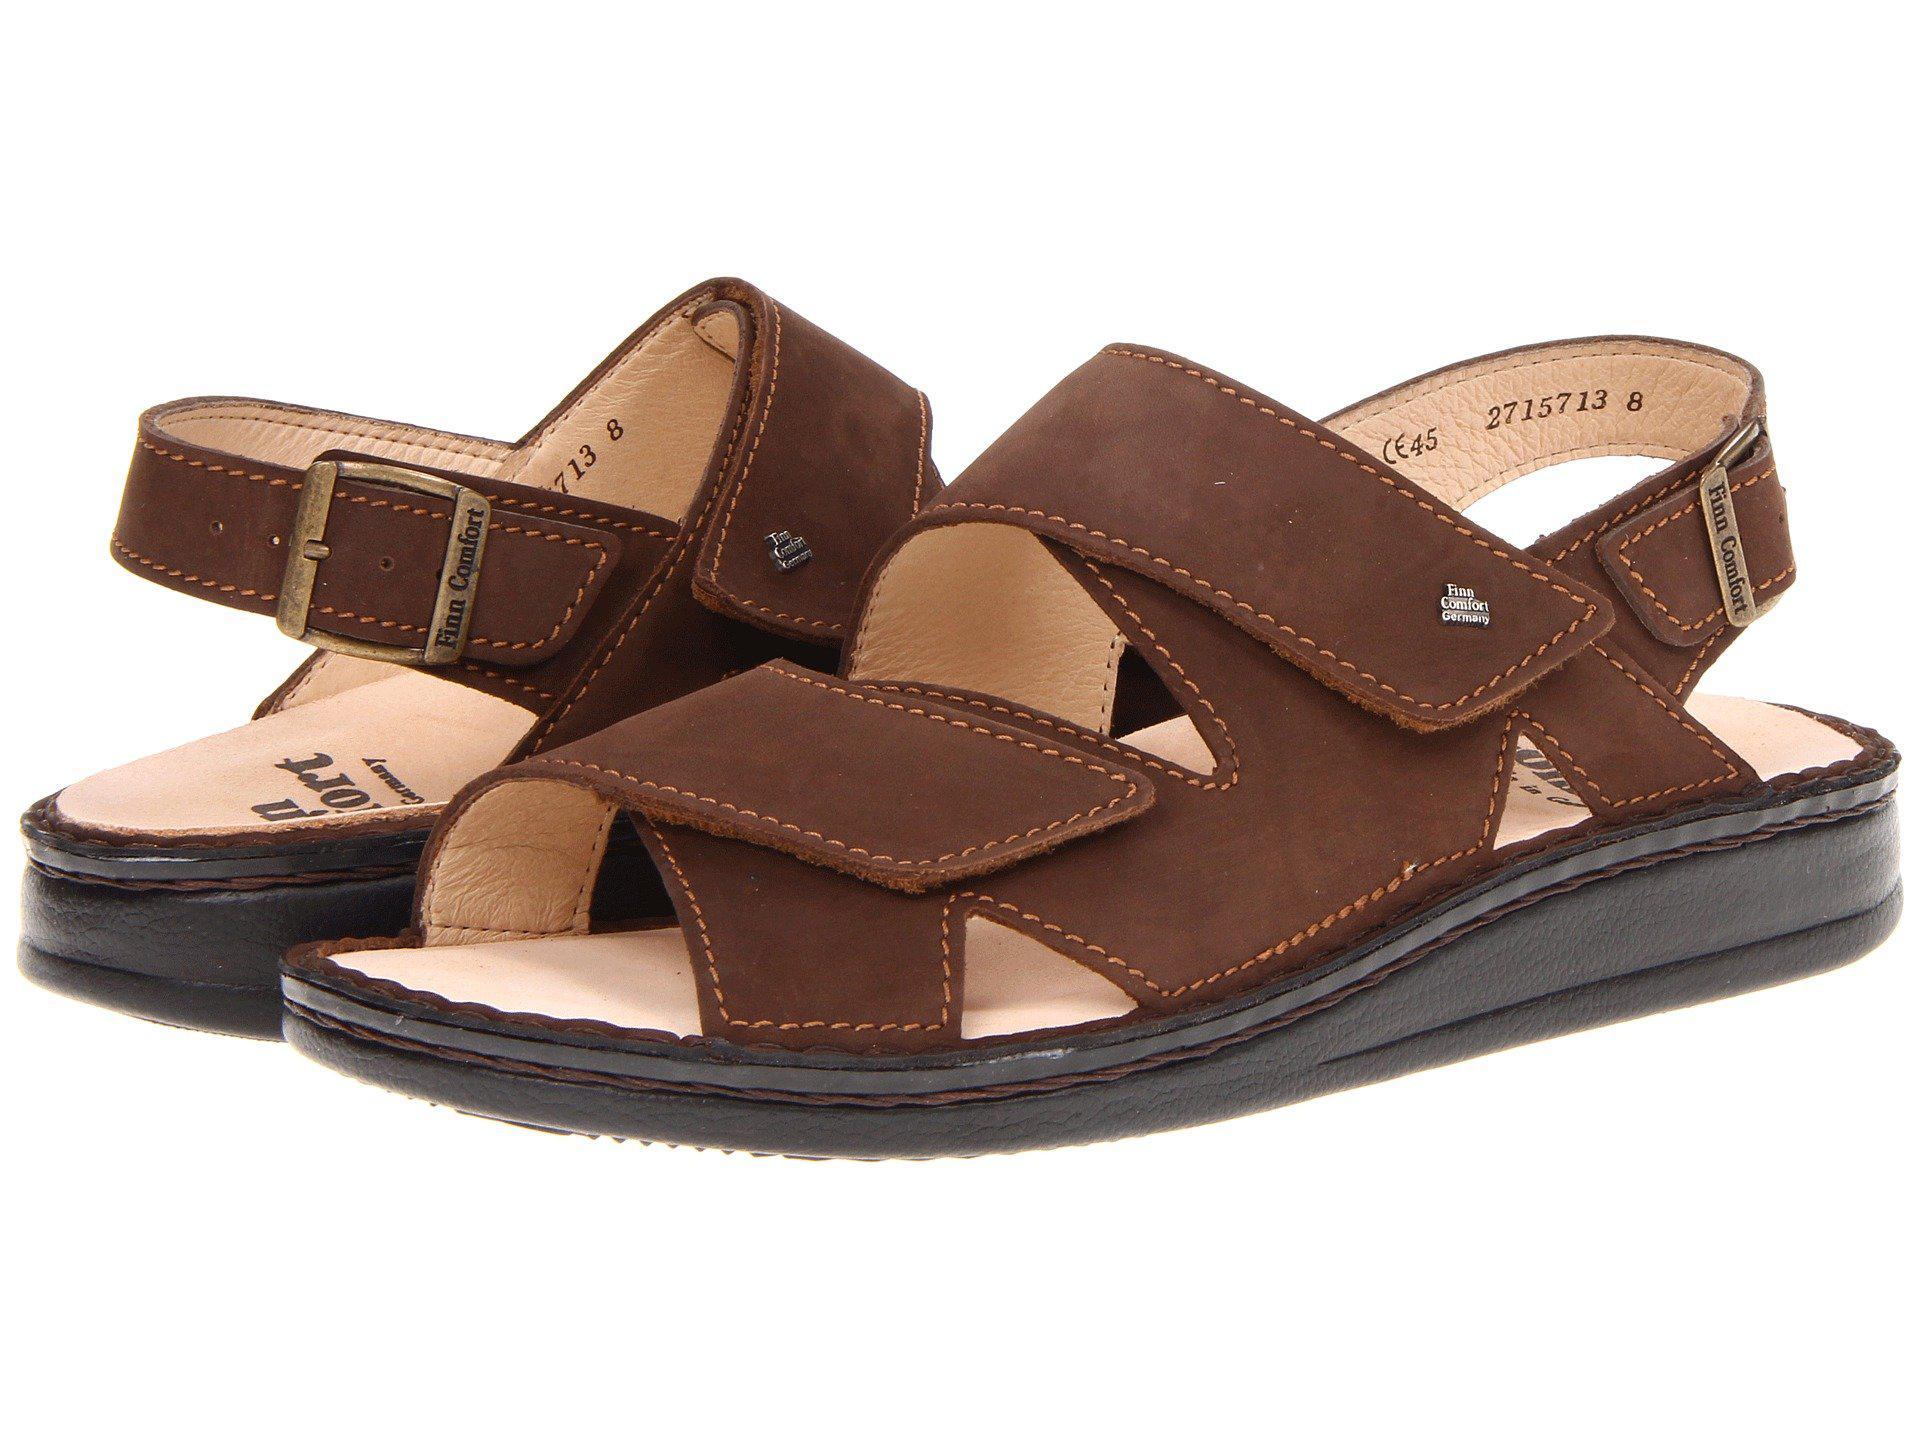 f8299a27178f Lyst - Finn Comfort Soft Toro - 81528 (wood) Men's Shoes in Brown ...